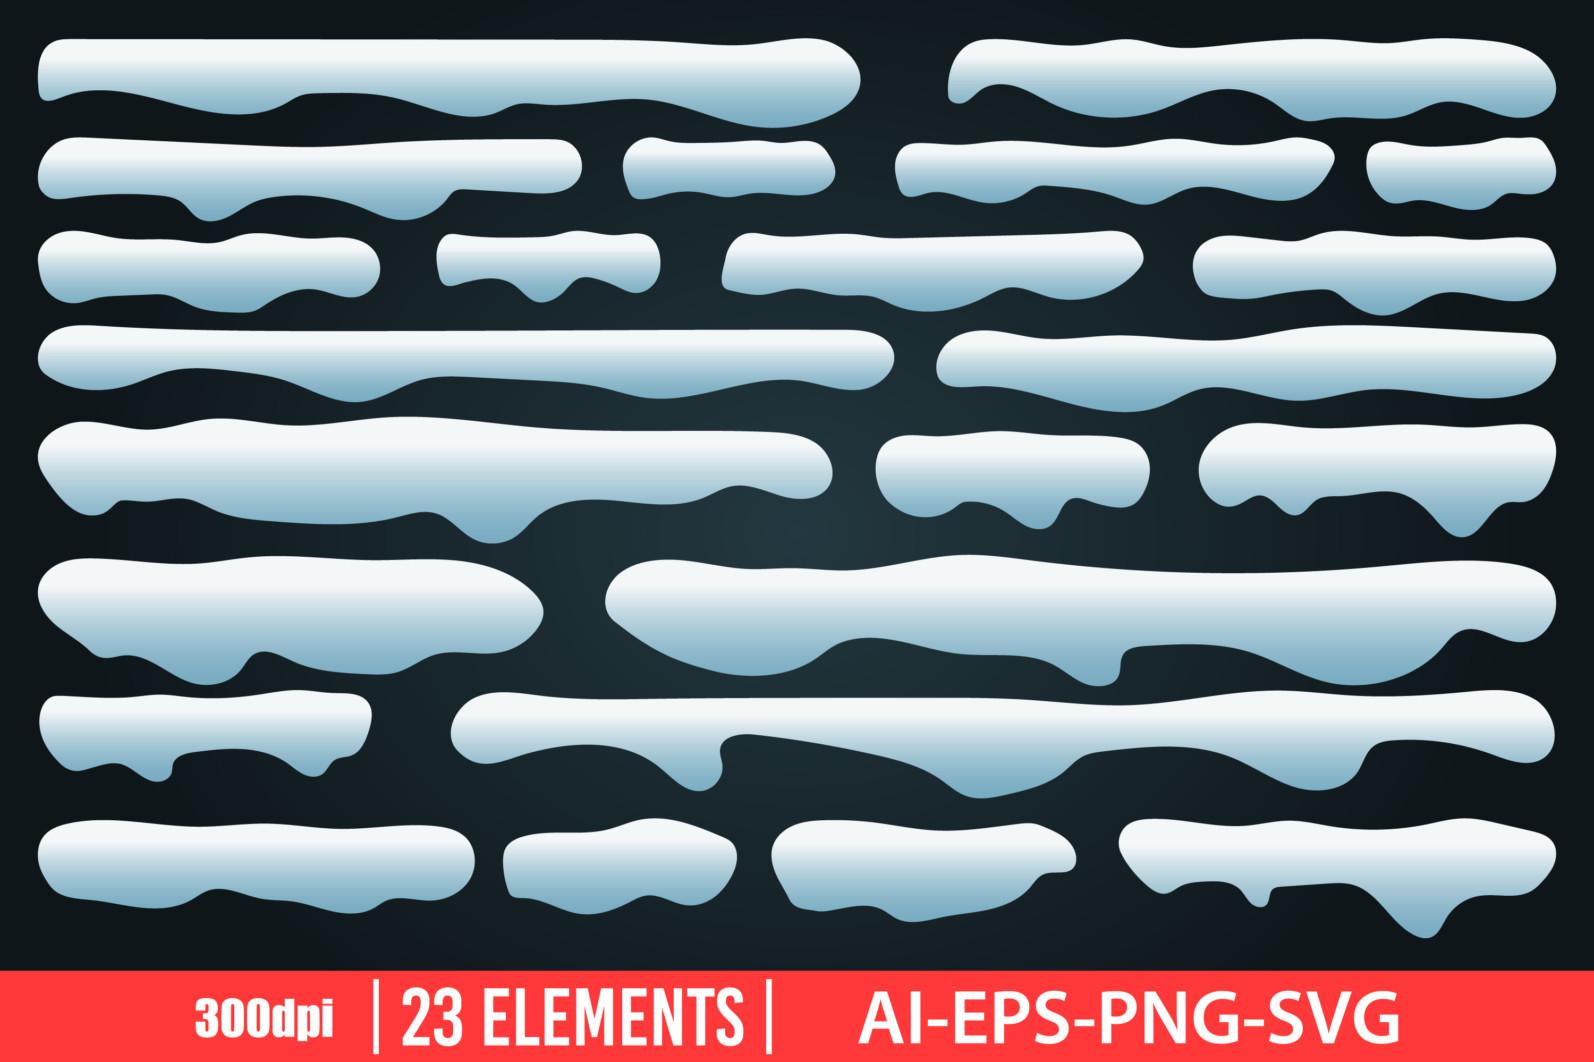 Snow caps clipart vector design illustration. Snow caps set. Vector Clipart Print - ICE CUPS scaled -